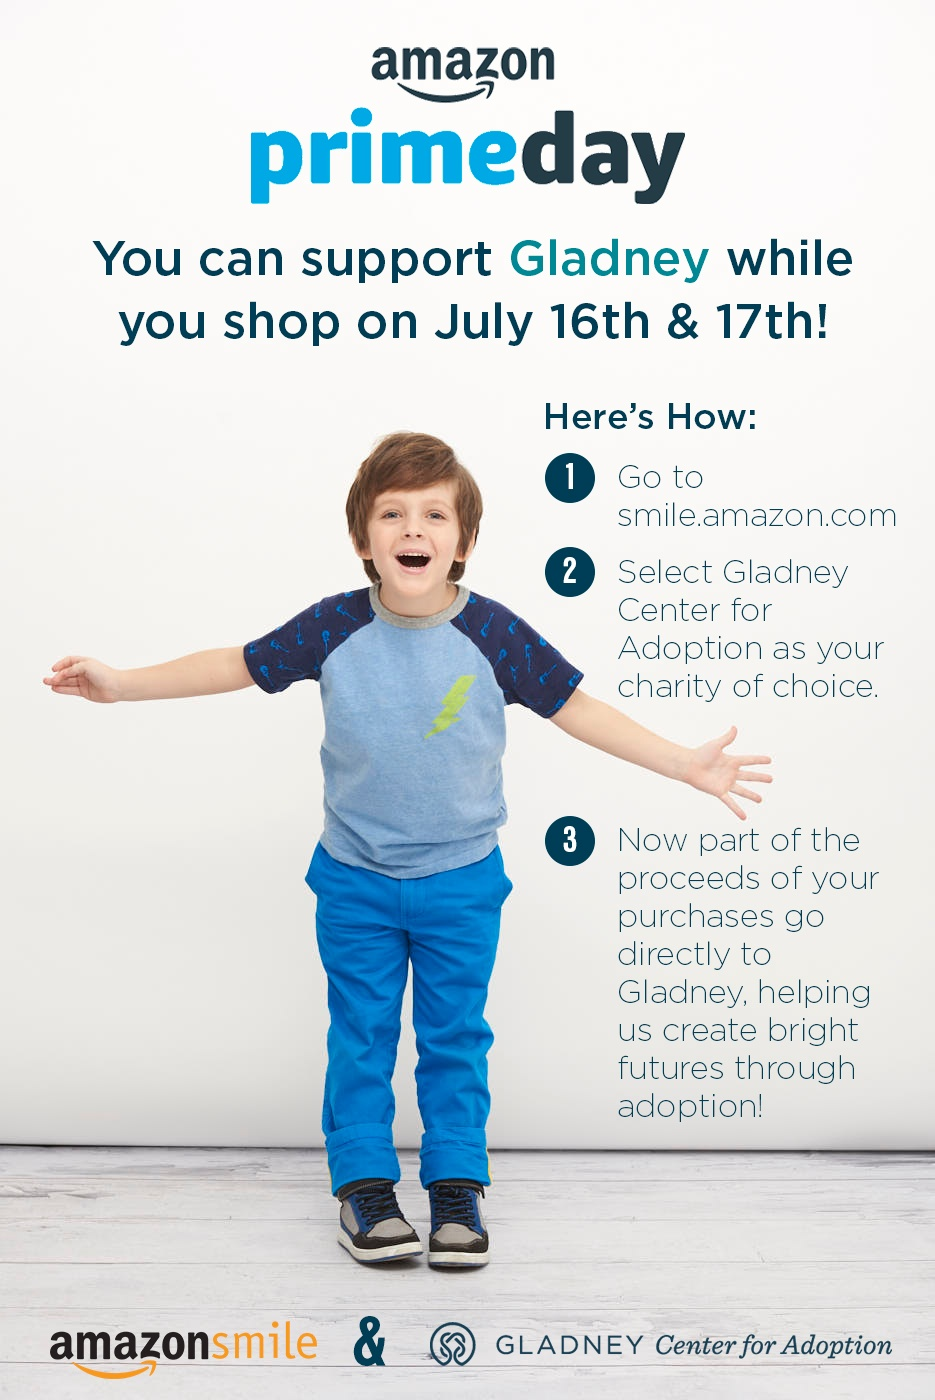 AmazonSmile & Gladney